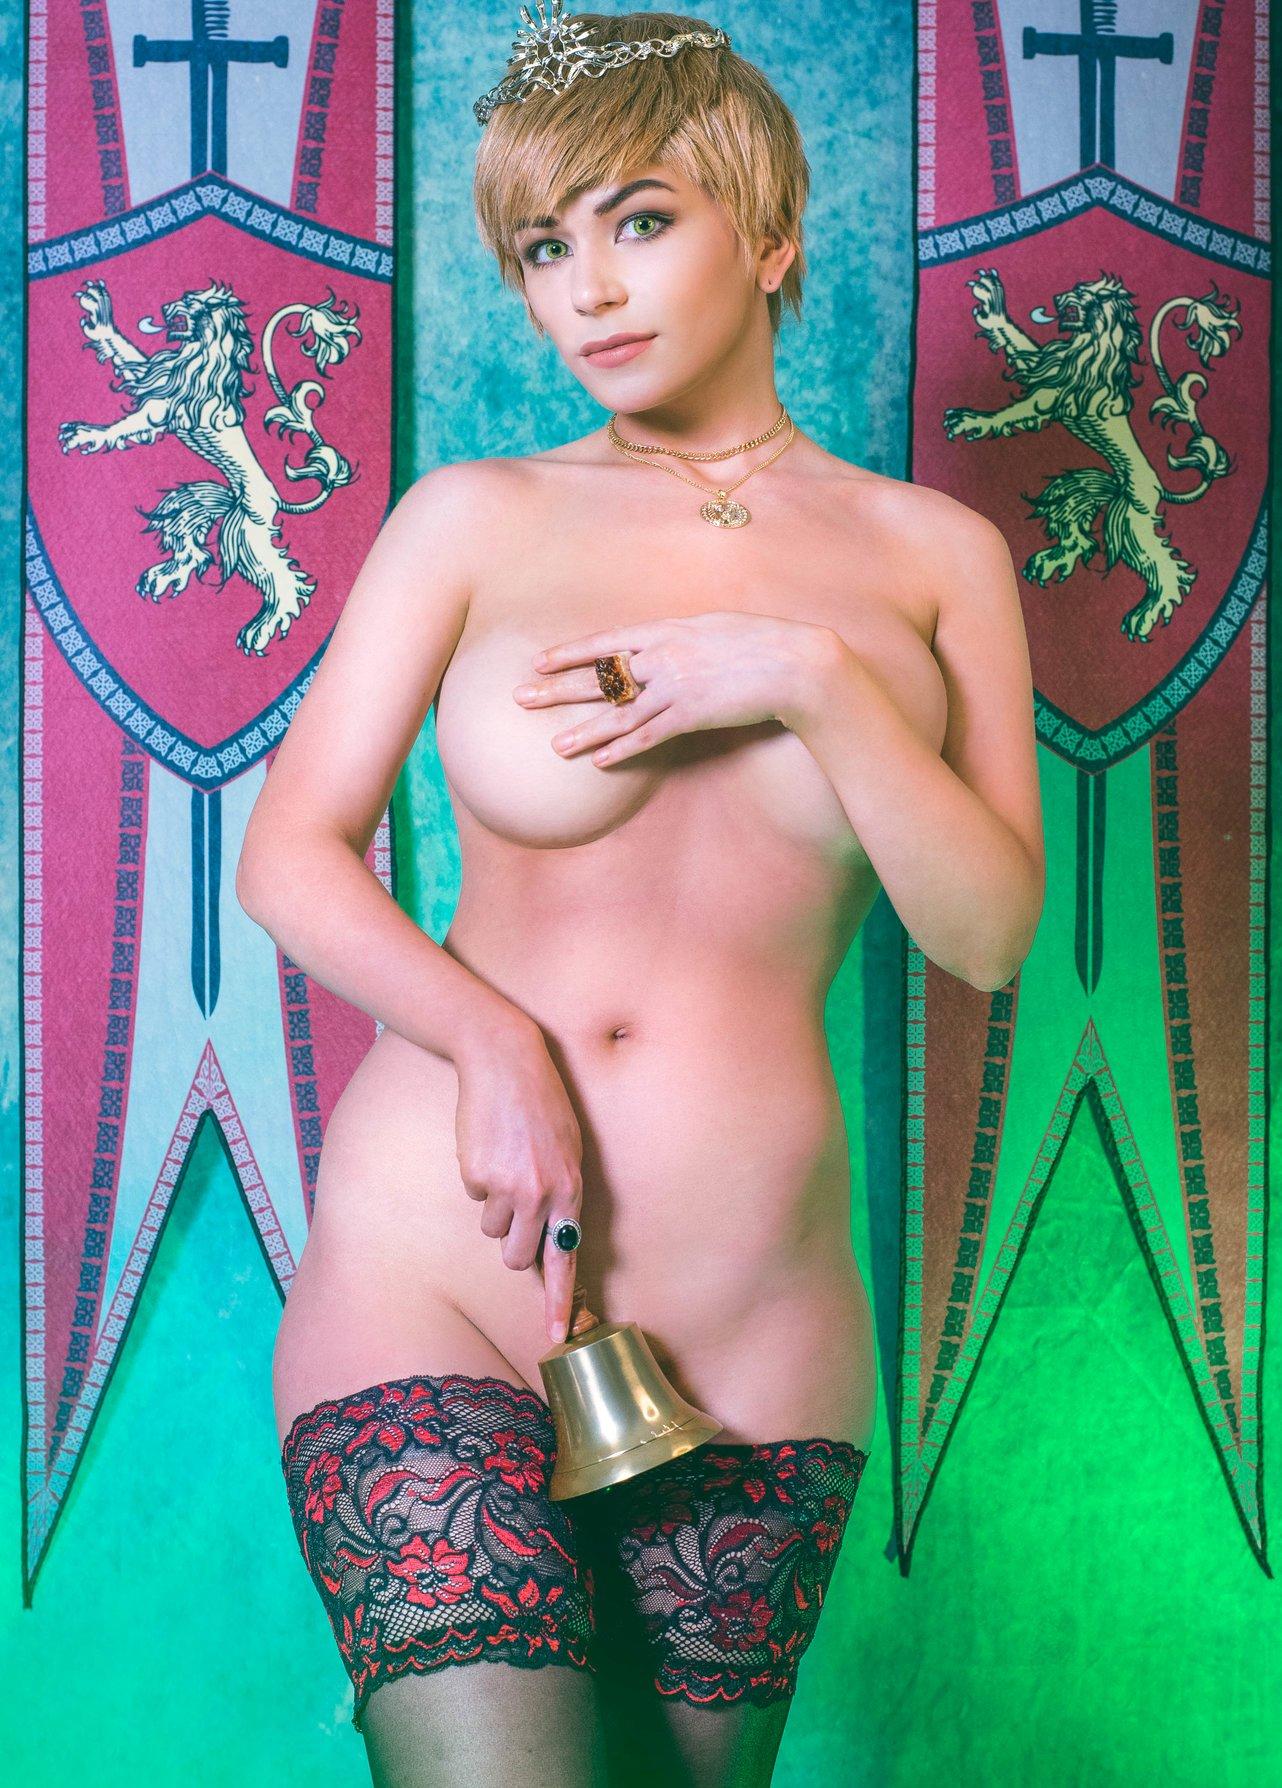 Danielle Beaulieu Daniellecosplay Onlyfans Nude Leaks 0040